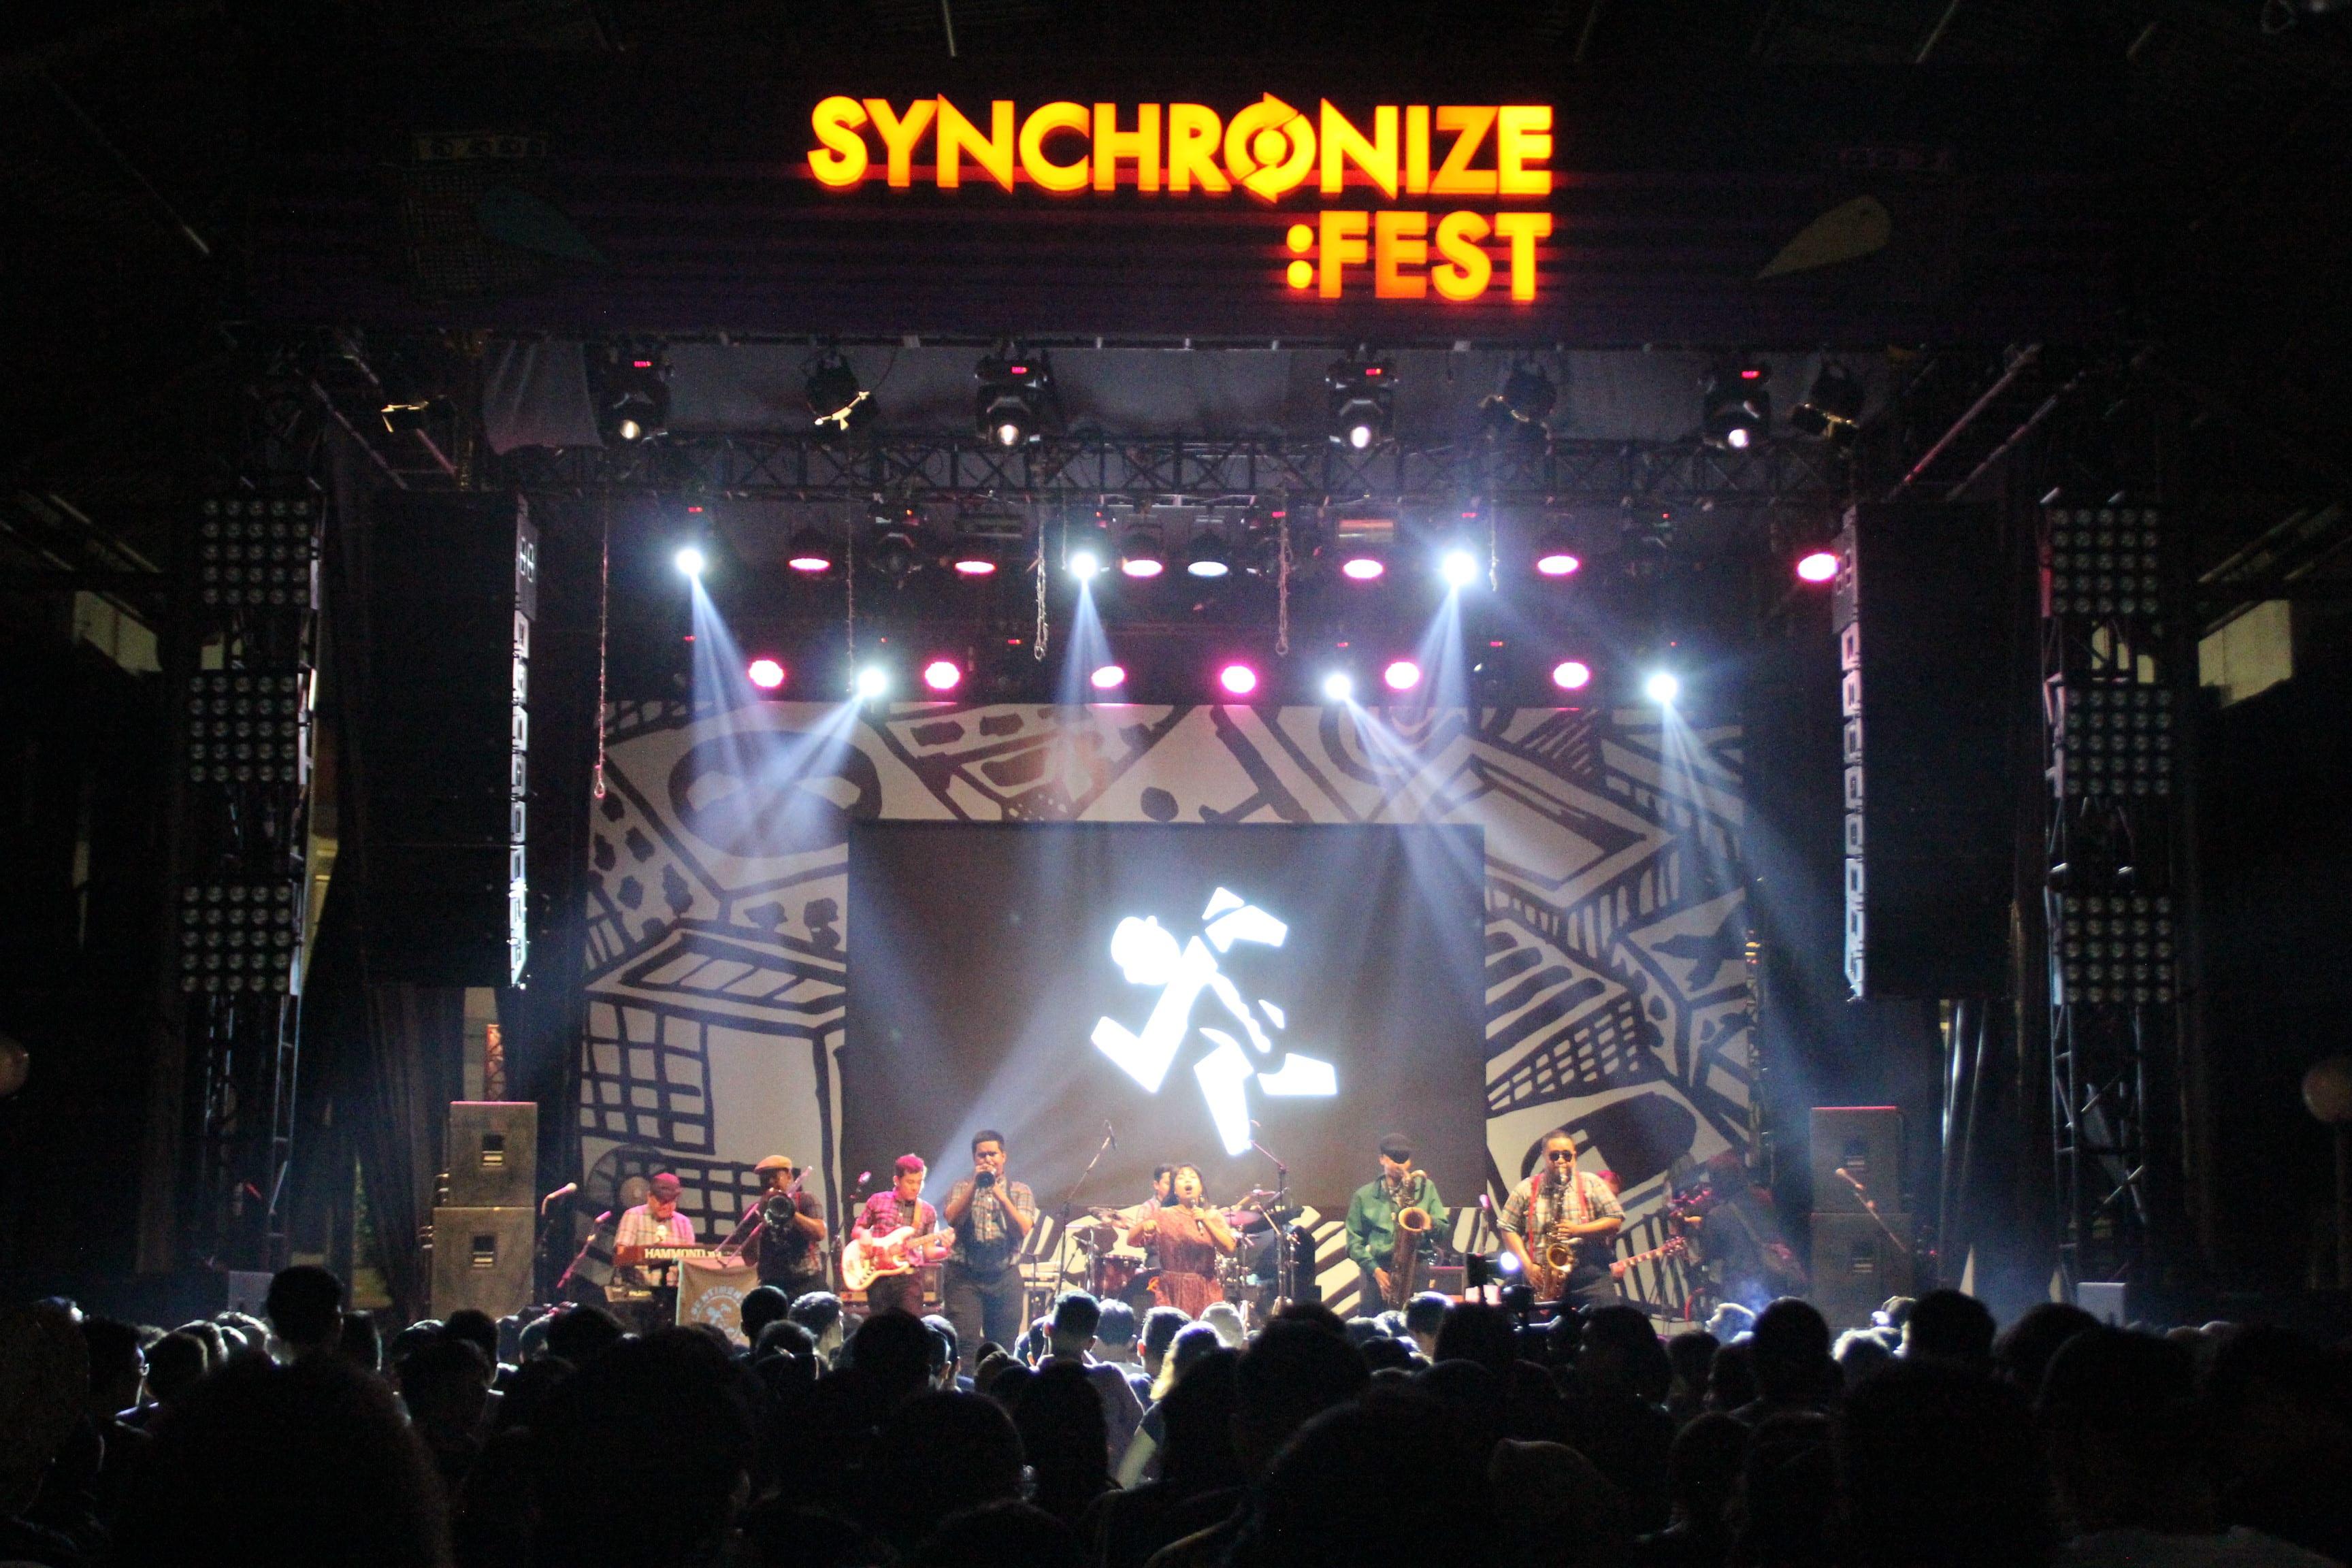 DISTRICK STAGE DENGAN TURBOSOUND DI SYNCHRONIZE FEST 2018